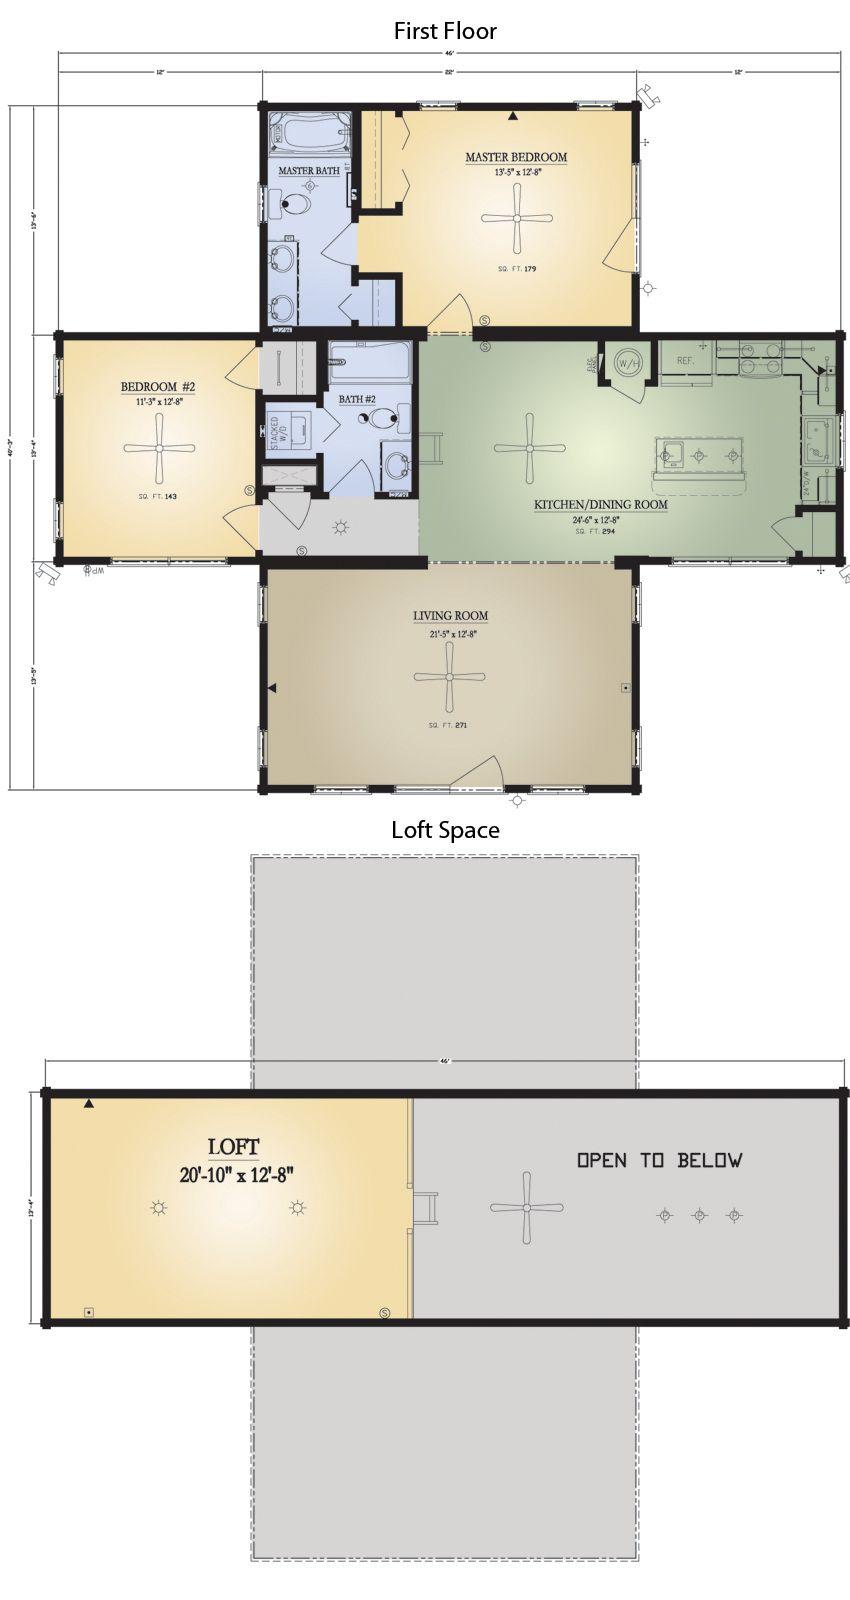 Flat Rock I Log Home Floor Plan Blue Ridge Log Cabins Log Home Floor Plans House Floor Plans Floor Plans